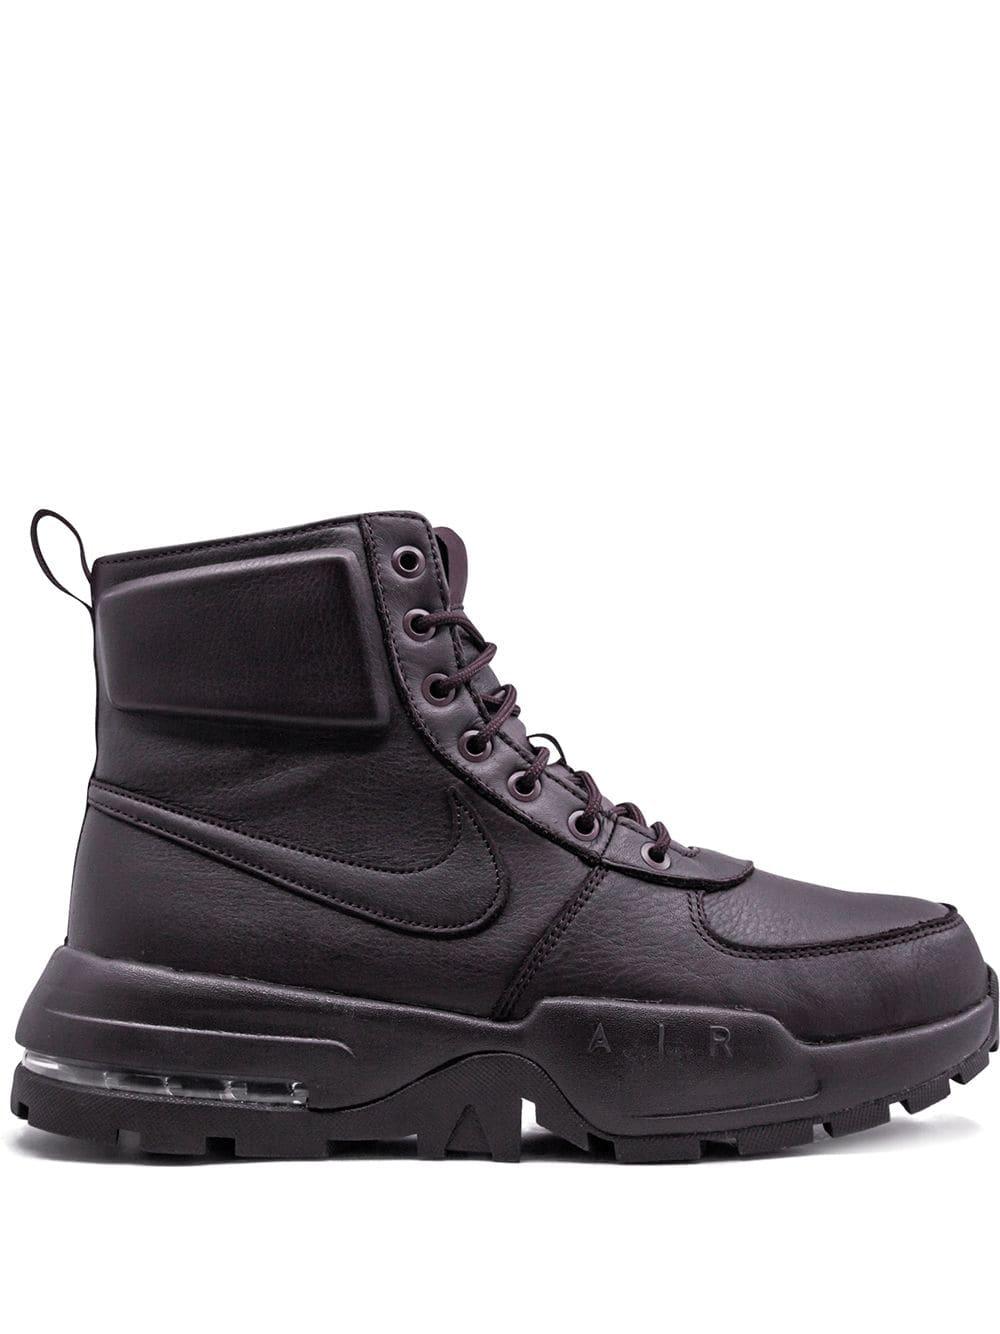 Nike 'air Max Goaterra 2.0' Sneakers